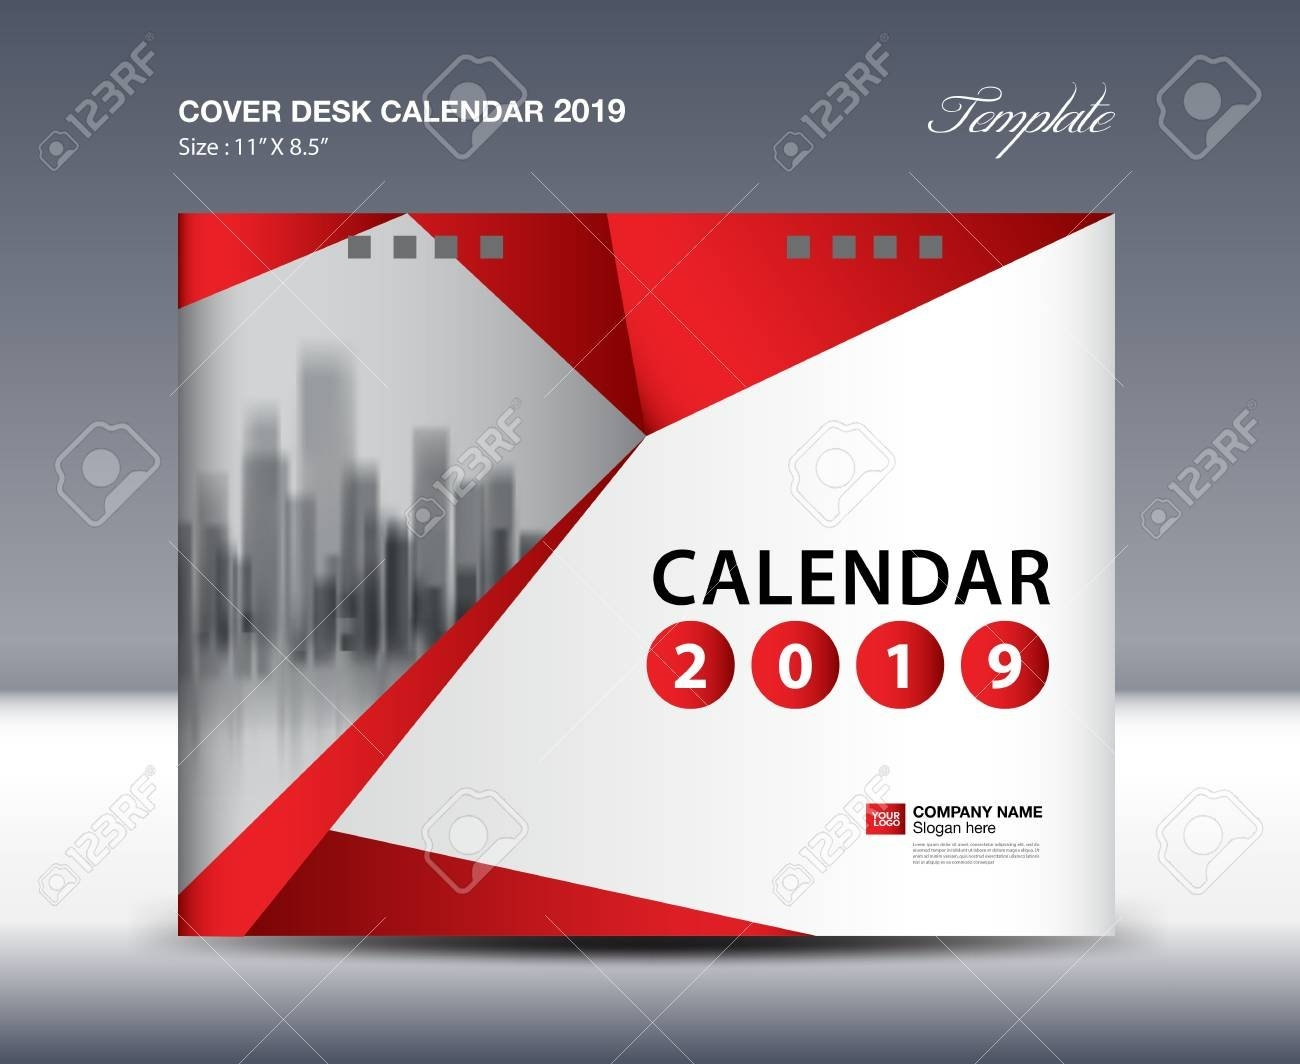 Cover Desk Calendar 2019 Design, Flyer Template, Ads, Booklet Calendar 2019 Design